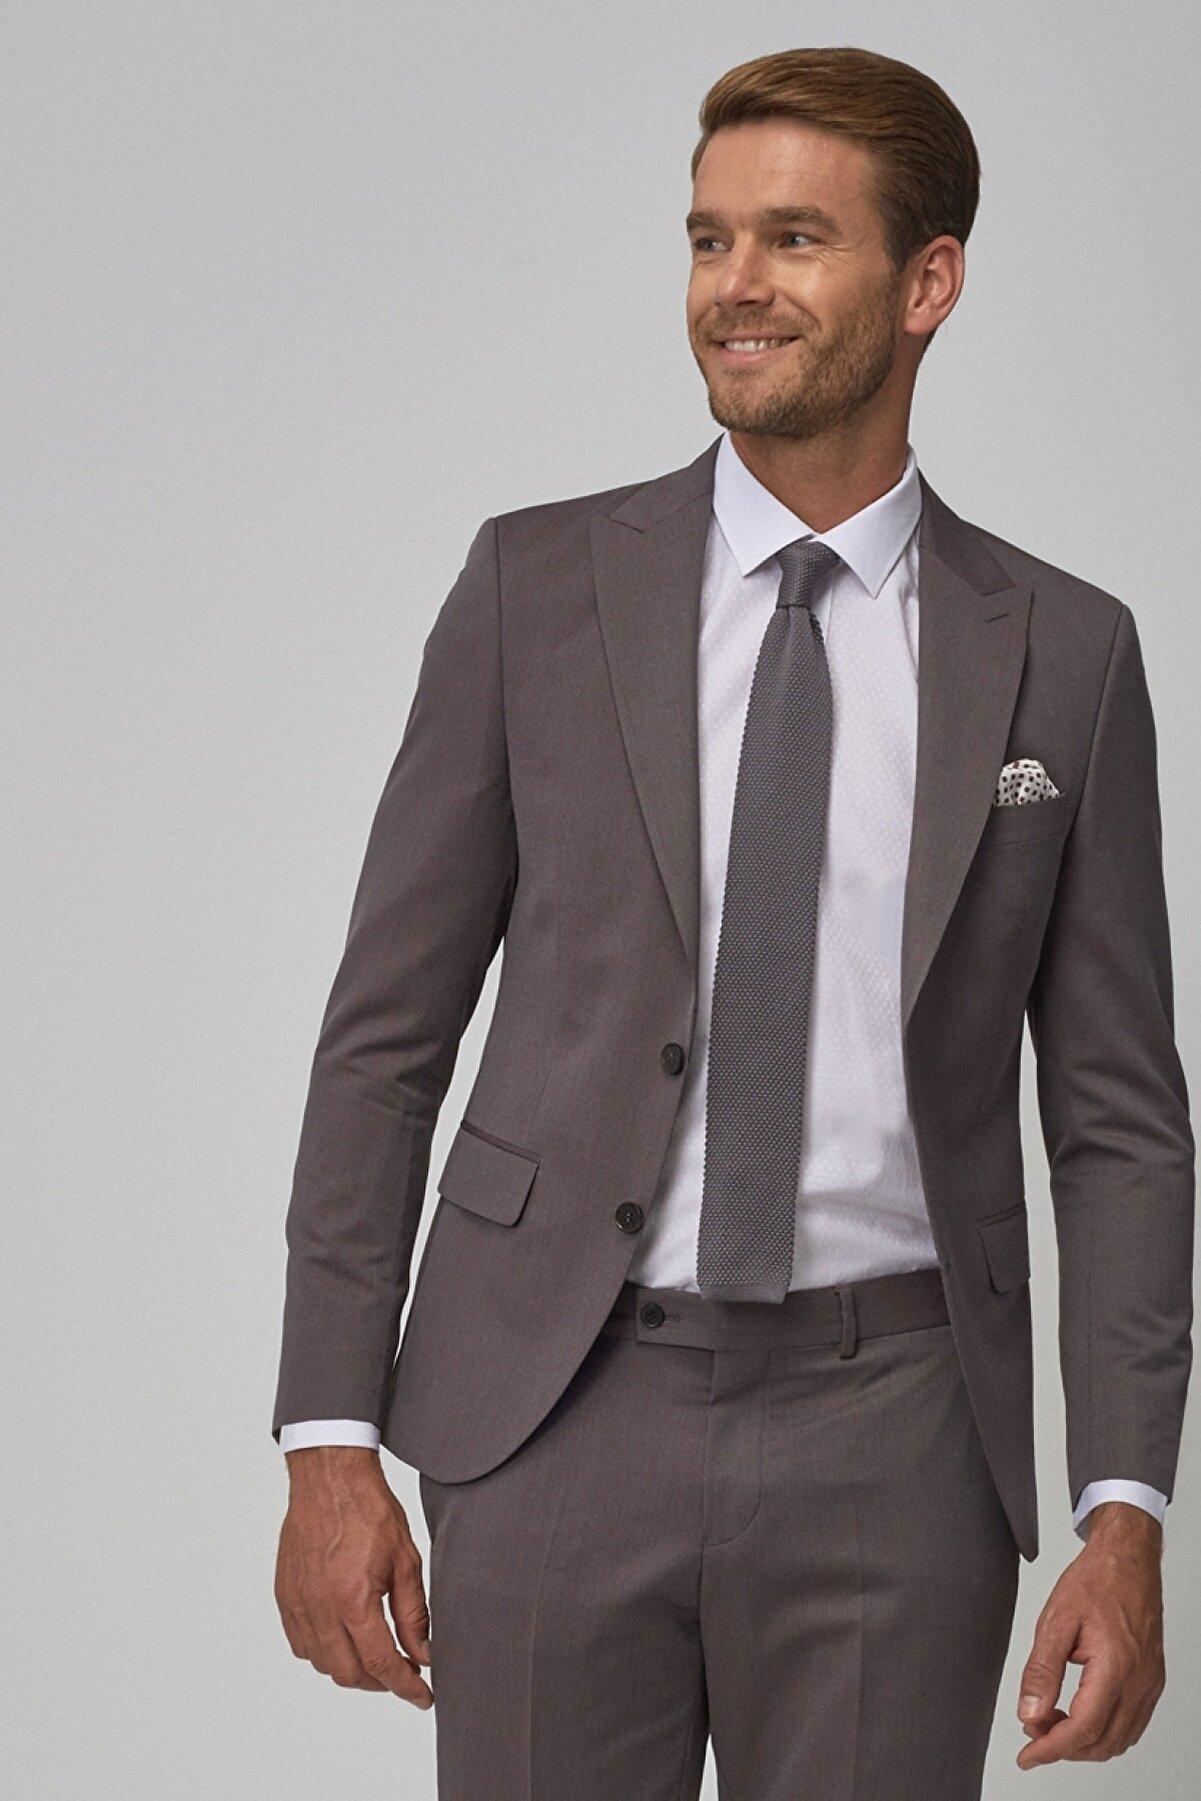 Altınyıldız Classics ERKEK Bordo-Gri Ekstra Slim Fit Dar Kesim Desenli Bordo-Gri Su Geçirmez Nano Takım Elbise